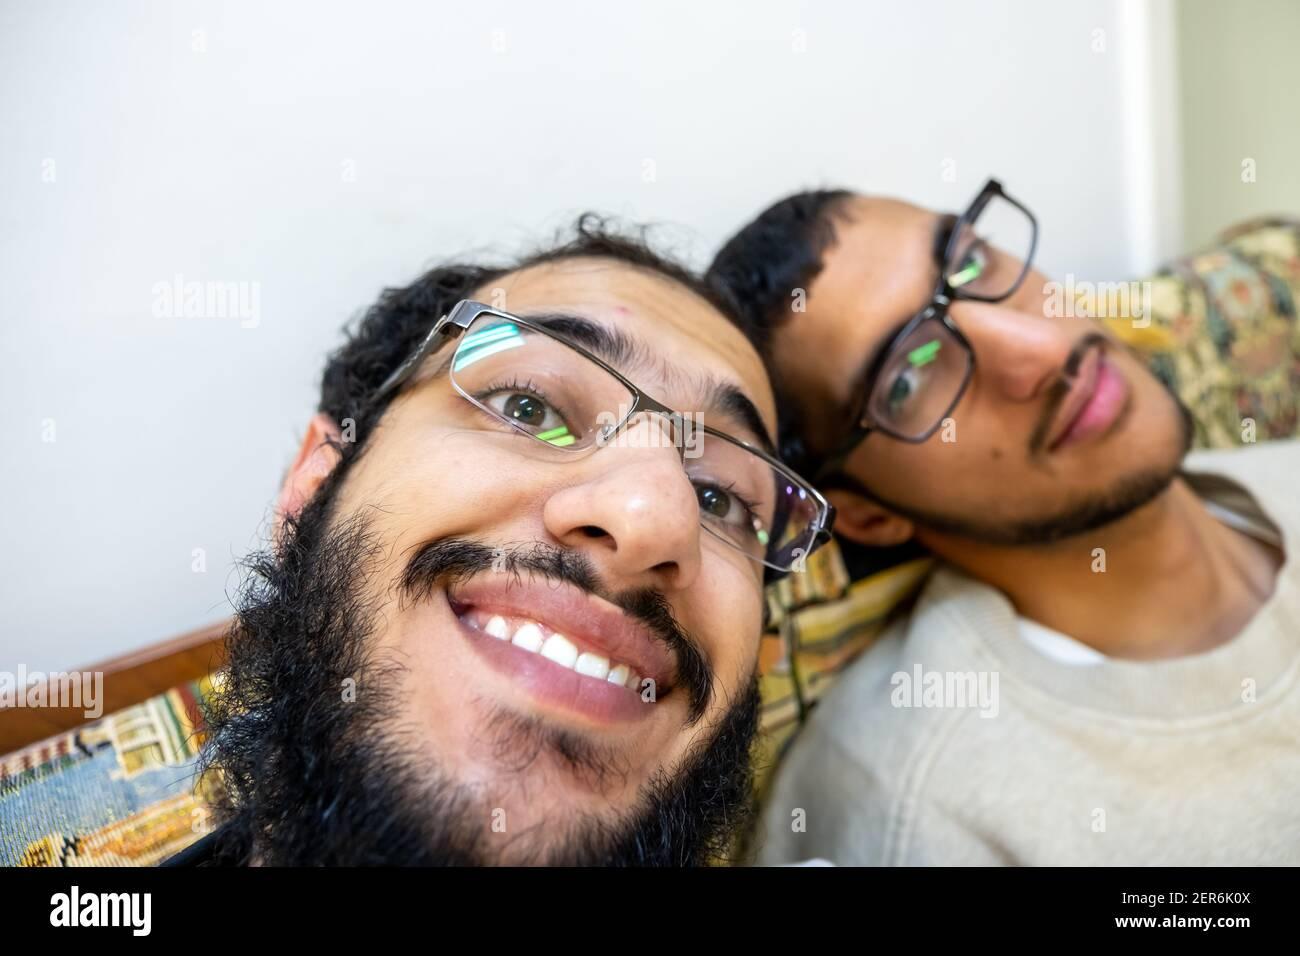 Guys of selfie pics 75+ Good